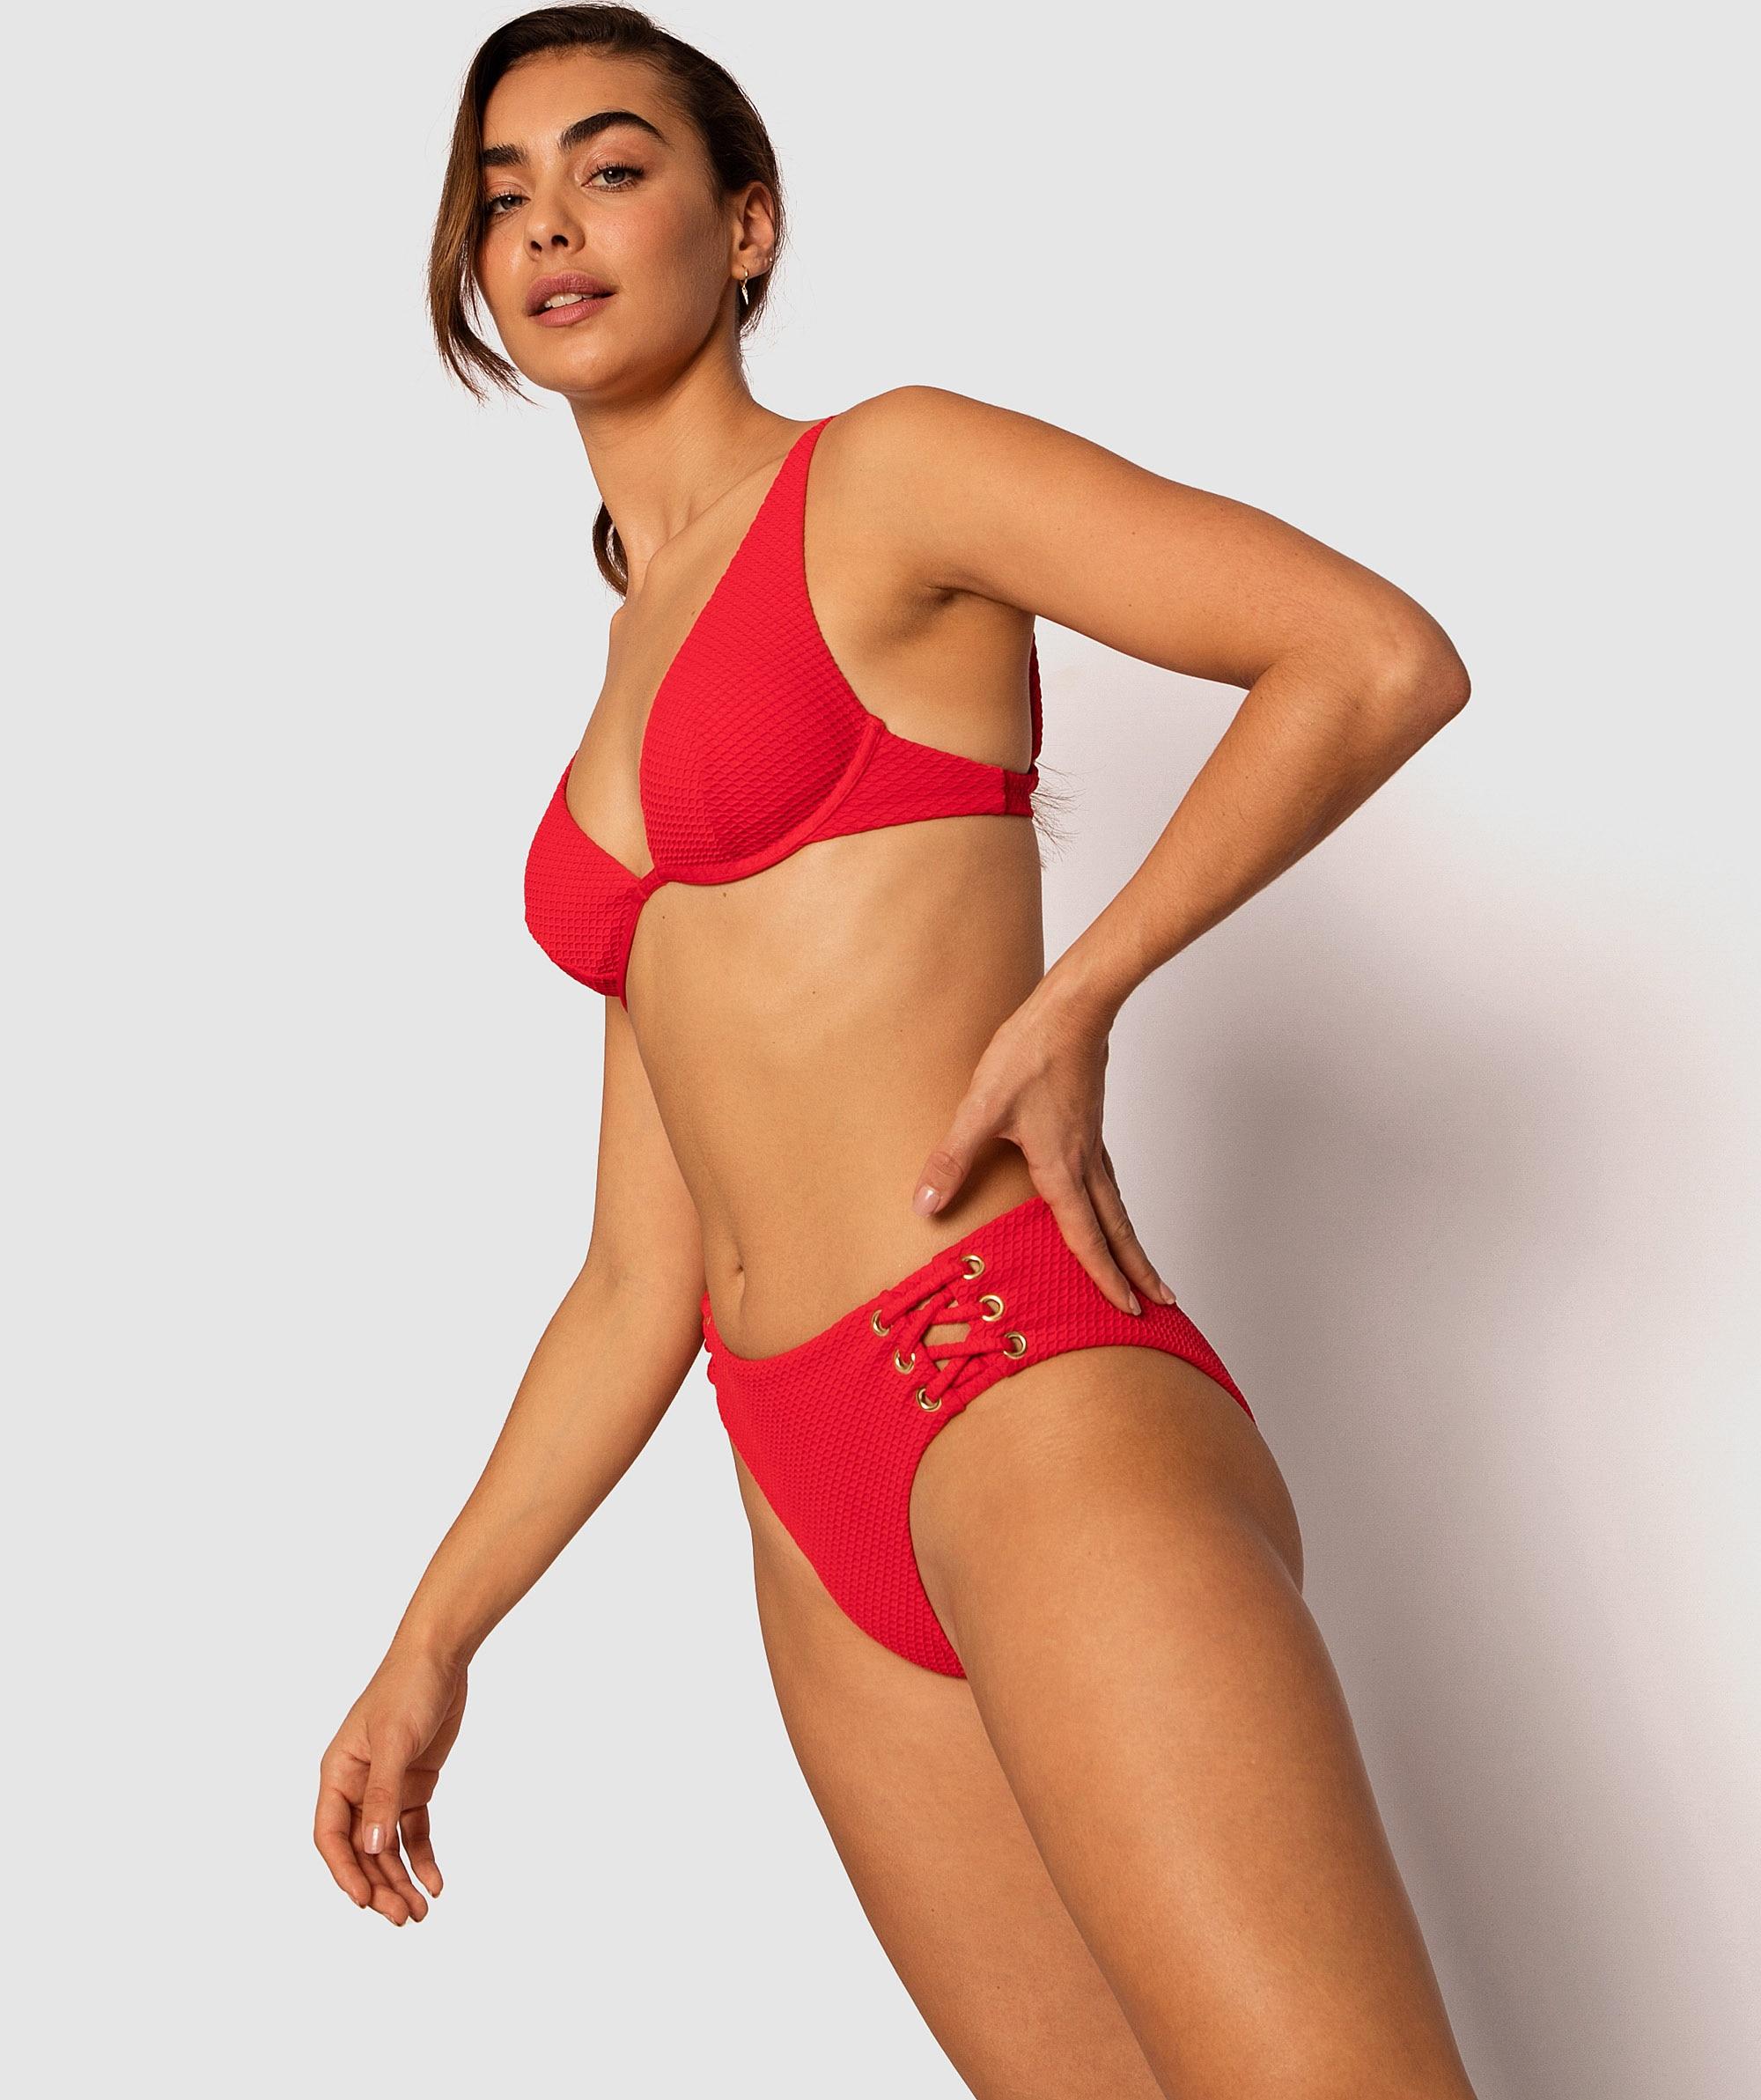 Vamp Bahamas Textured Swim High Pants - Red